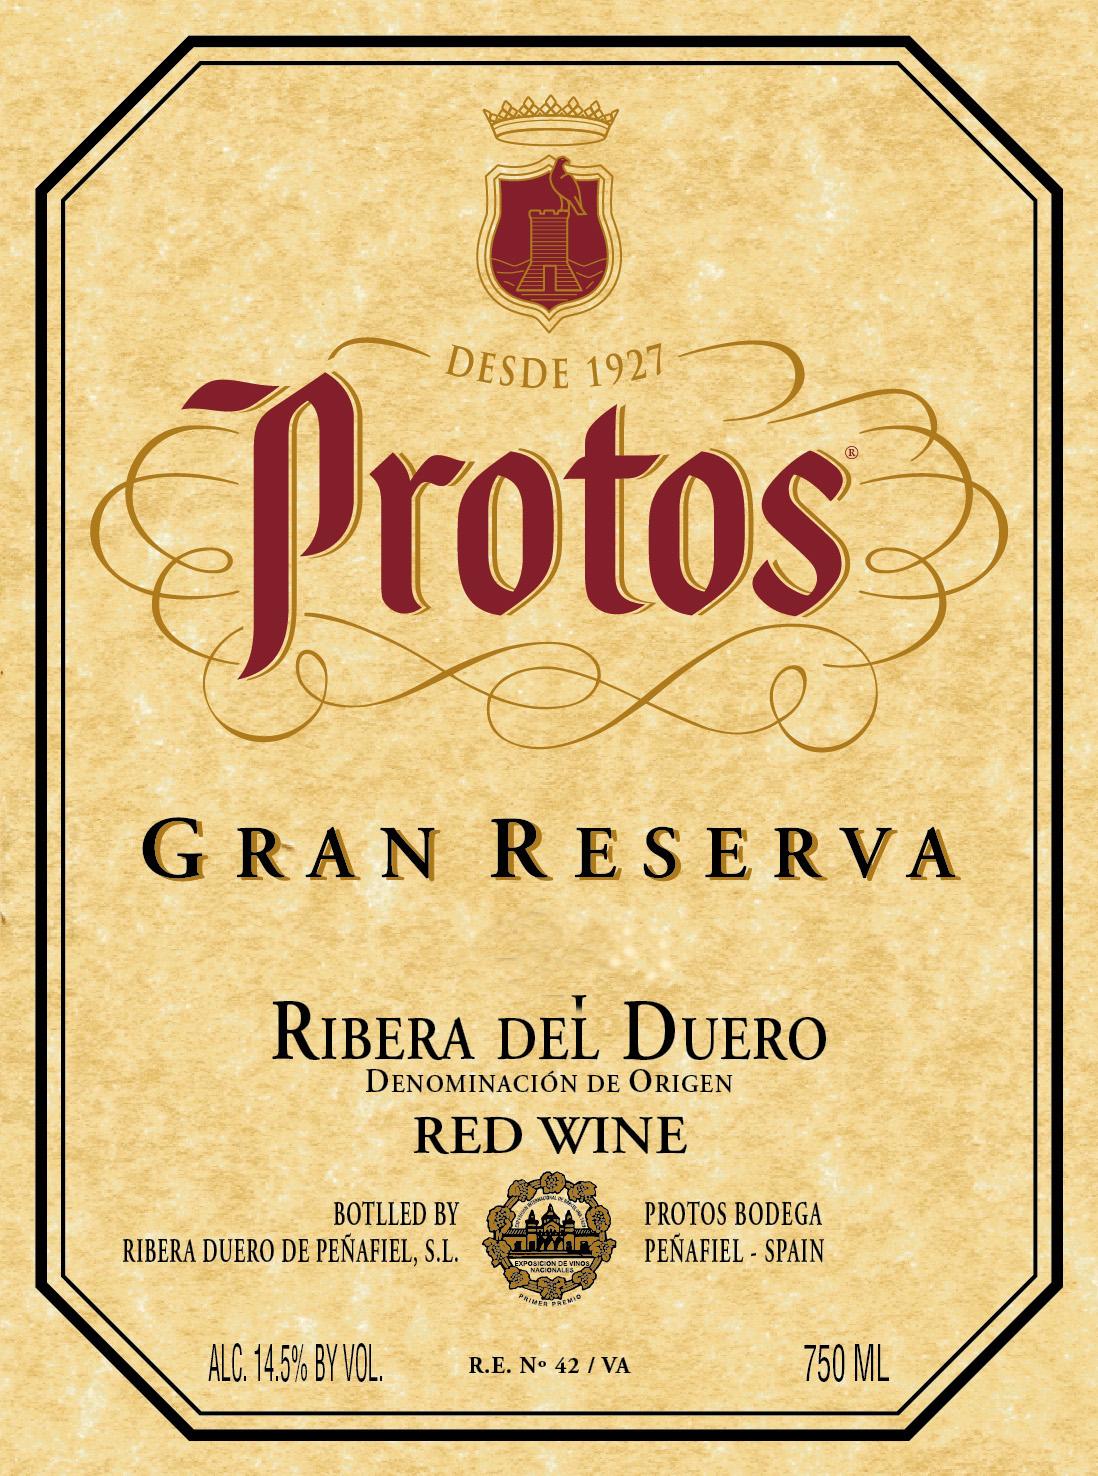 Protos - Gran Reserva label